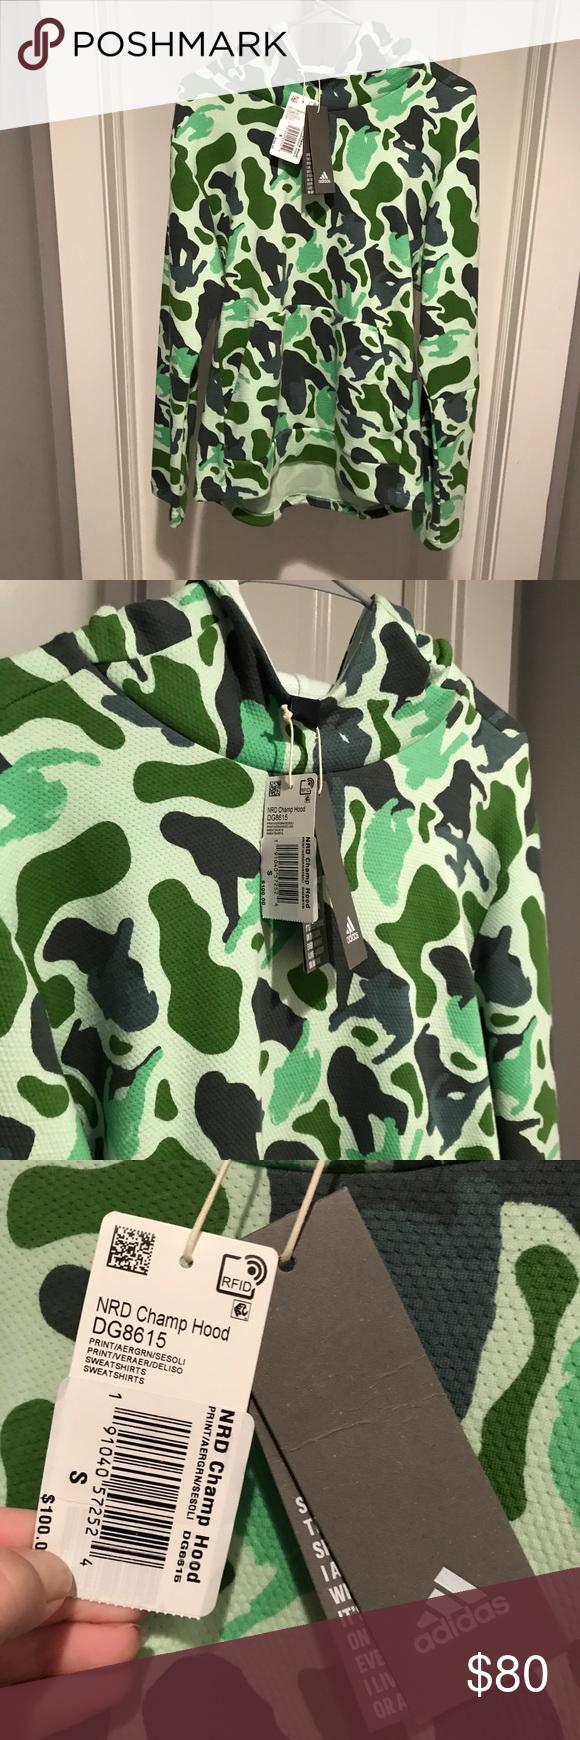 Nwt Adidas Camo N E R D Id Champ Hoodie Size S Adidas Camo Clothes Design Hoodies [ 1740 x 580 Pixel ]